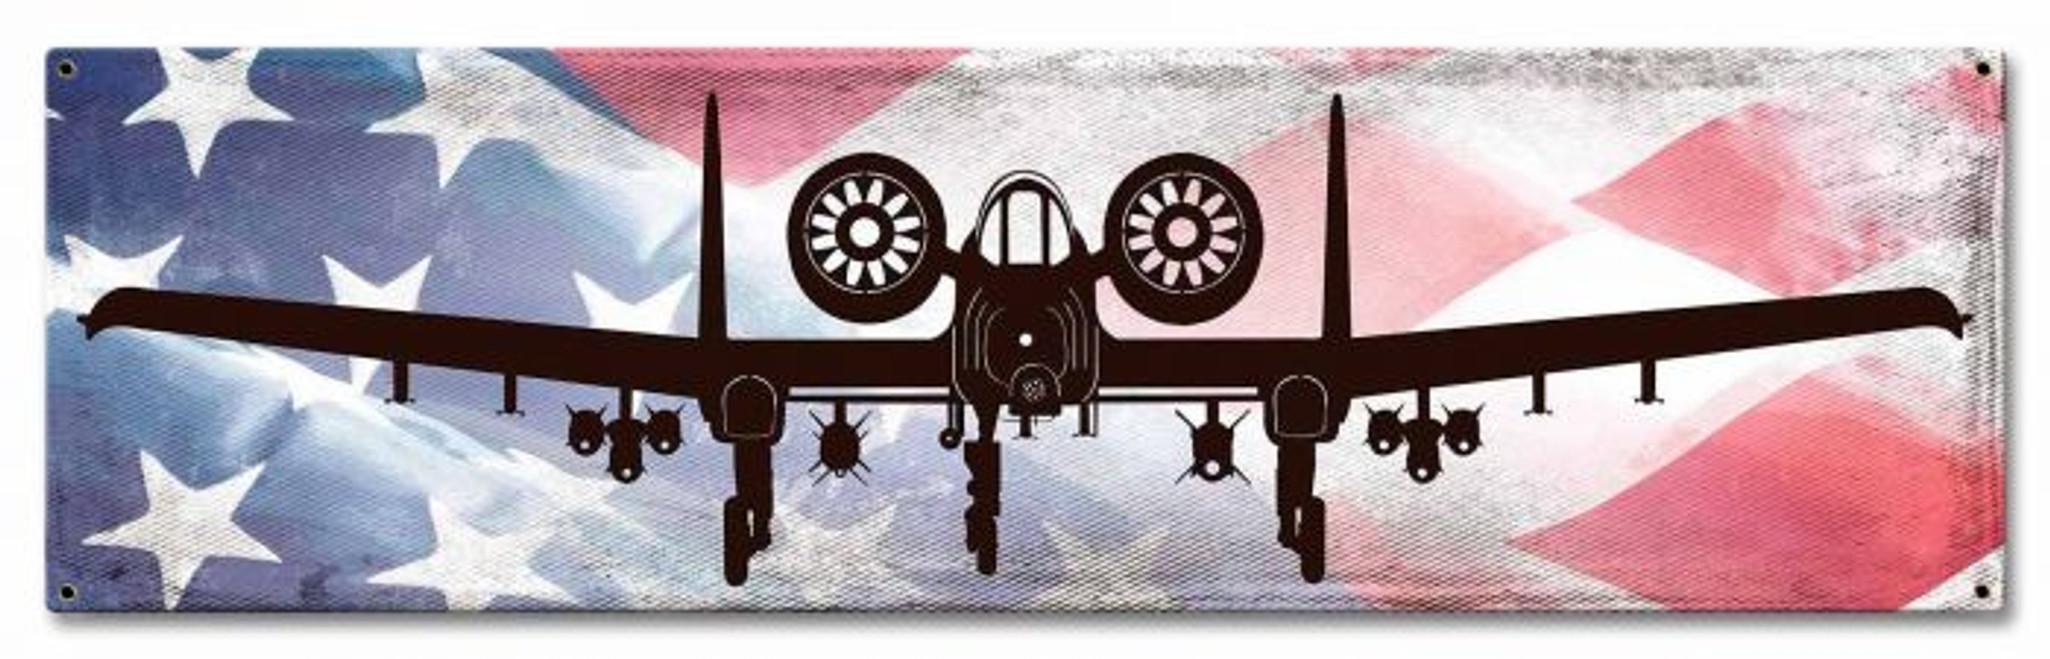 A10A Thunderbolt II  & American Flag  METAL SIGN